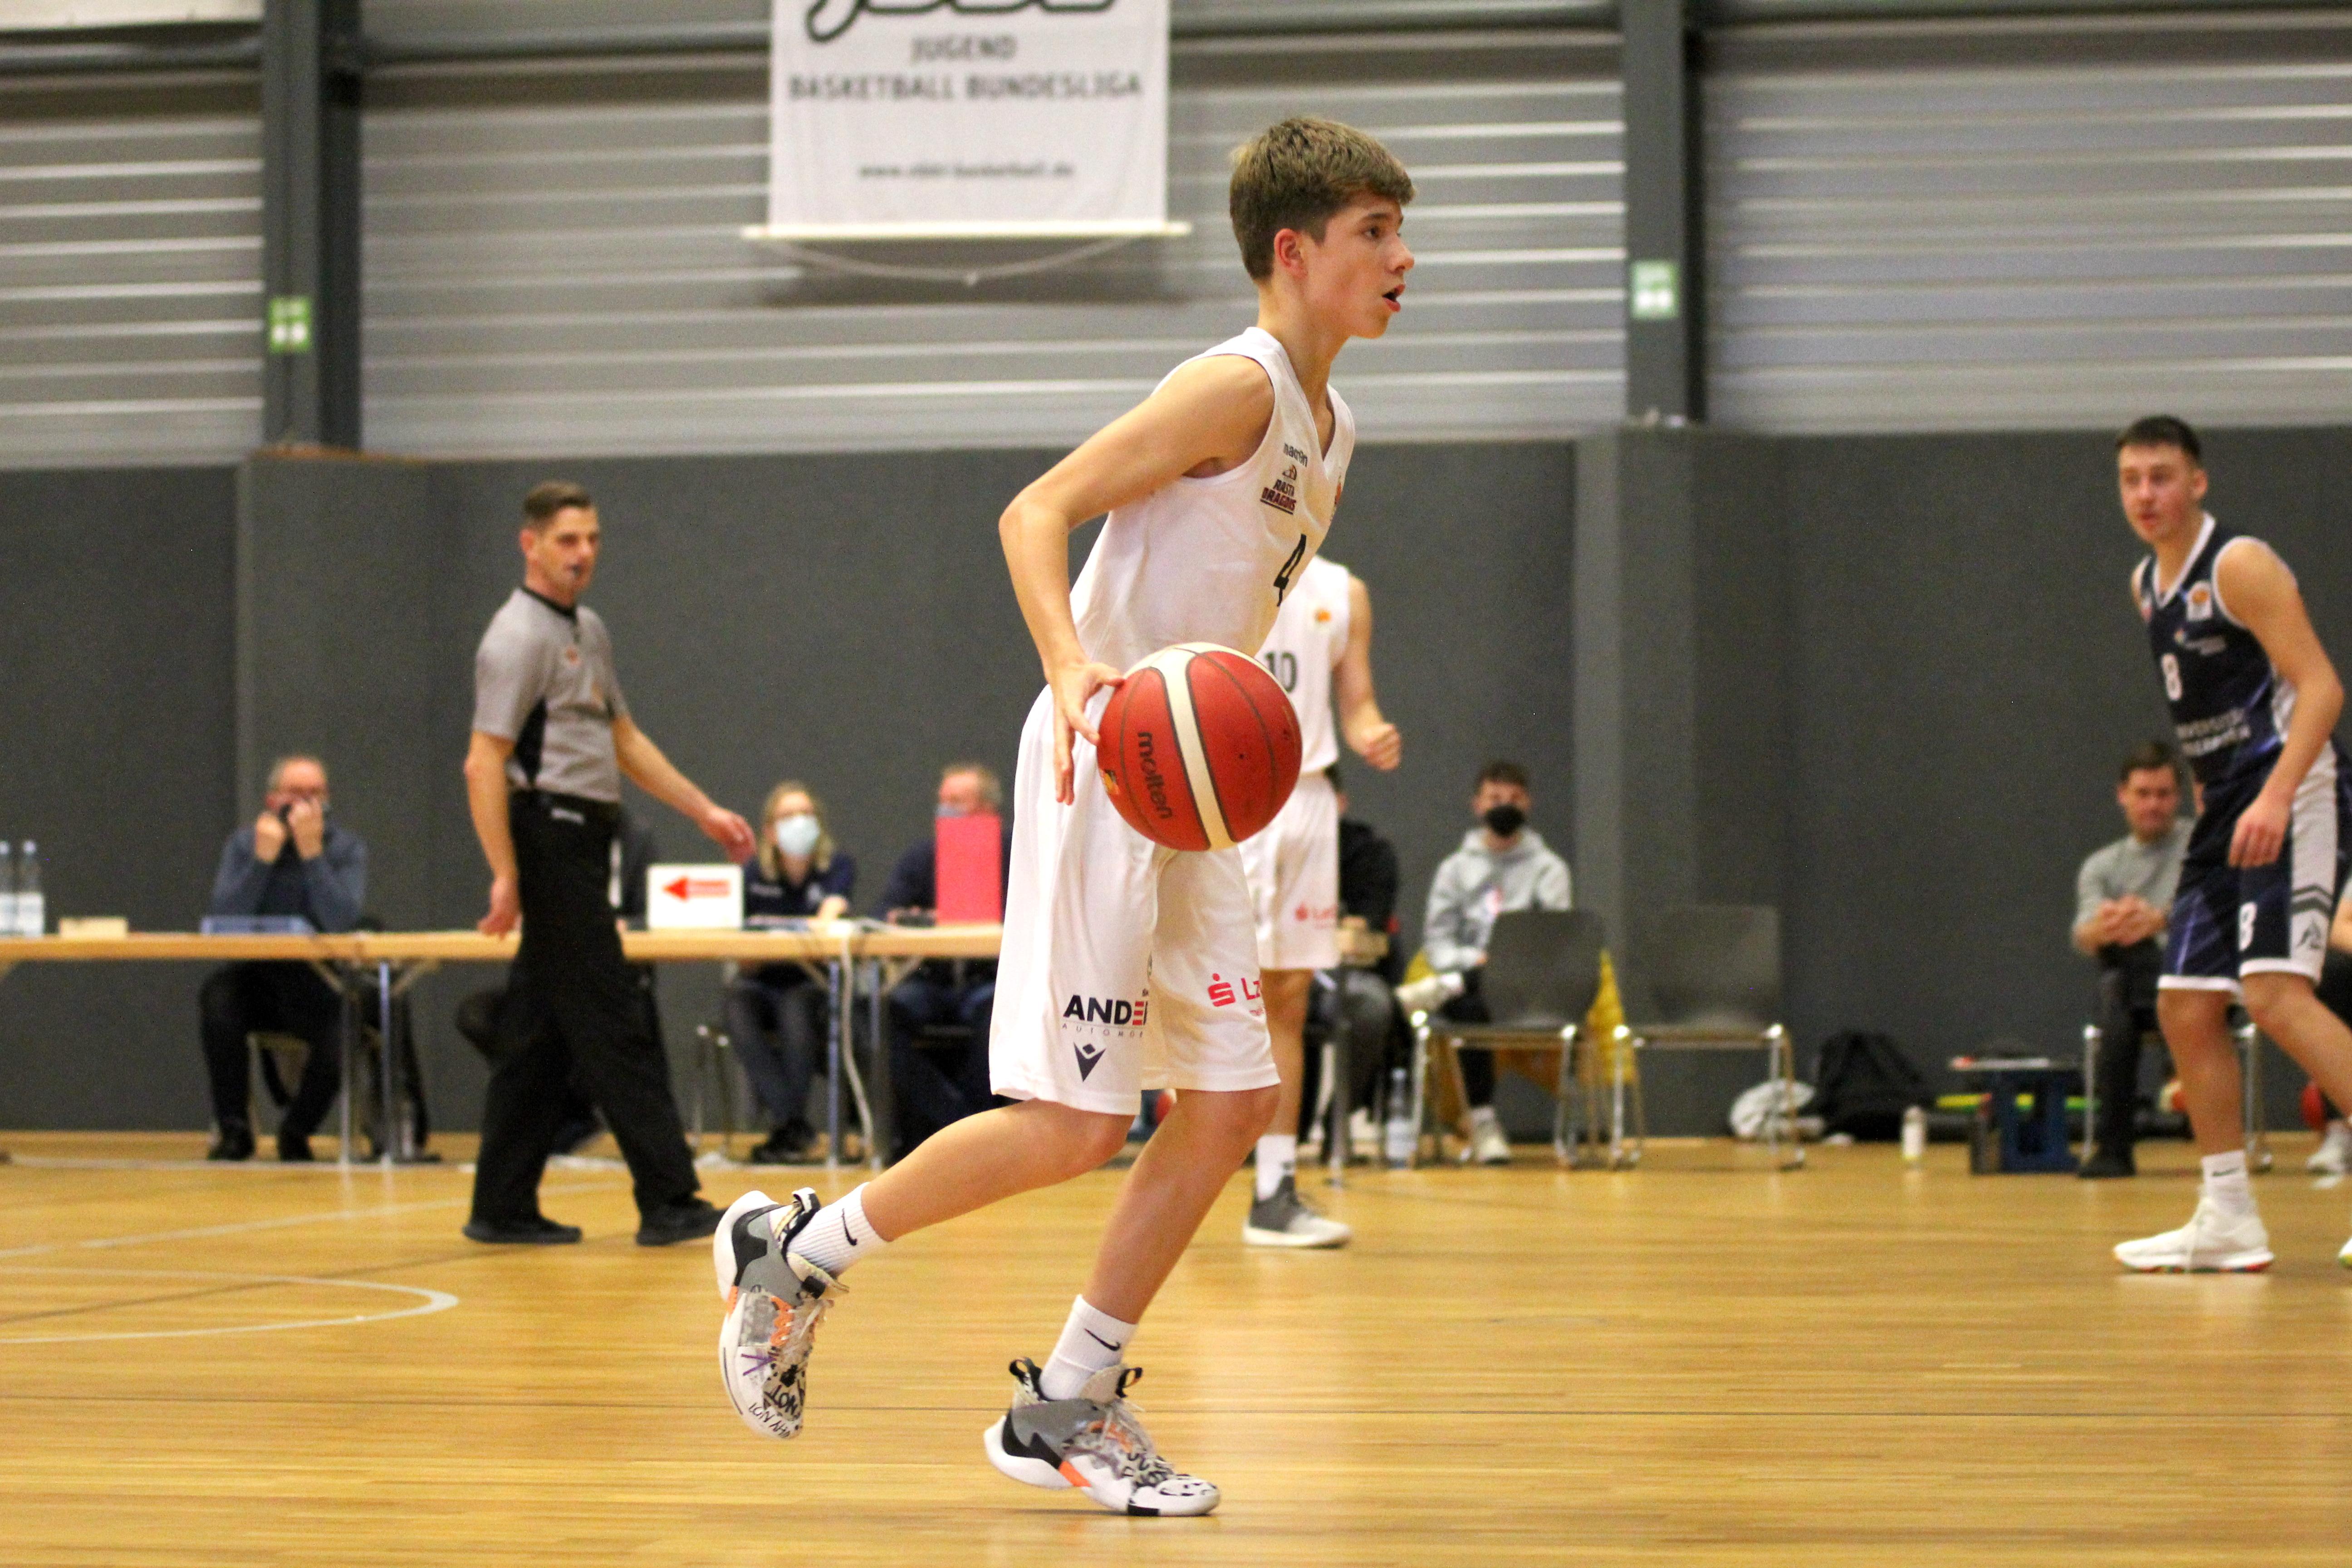 1_JBBL_20-21_YOUNG-RASTA-DRAGONS_Paderborn_Spieltag2_Jonas-Groß4